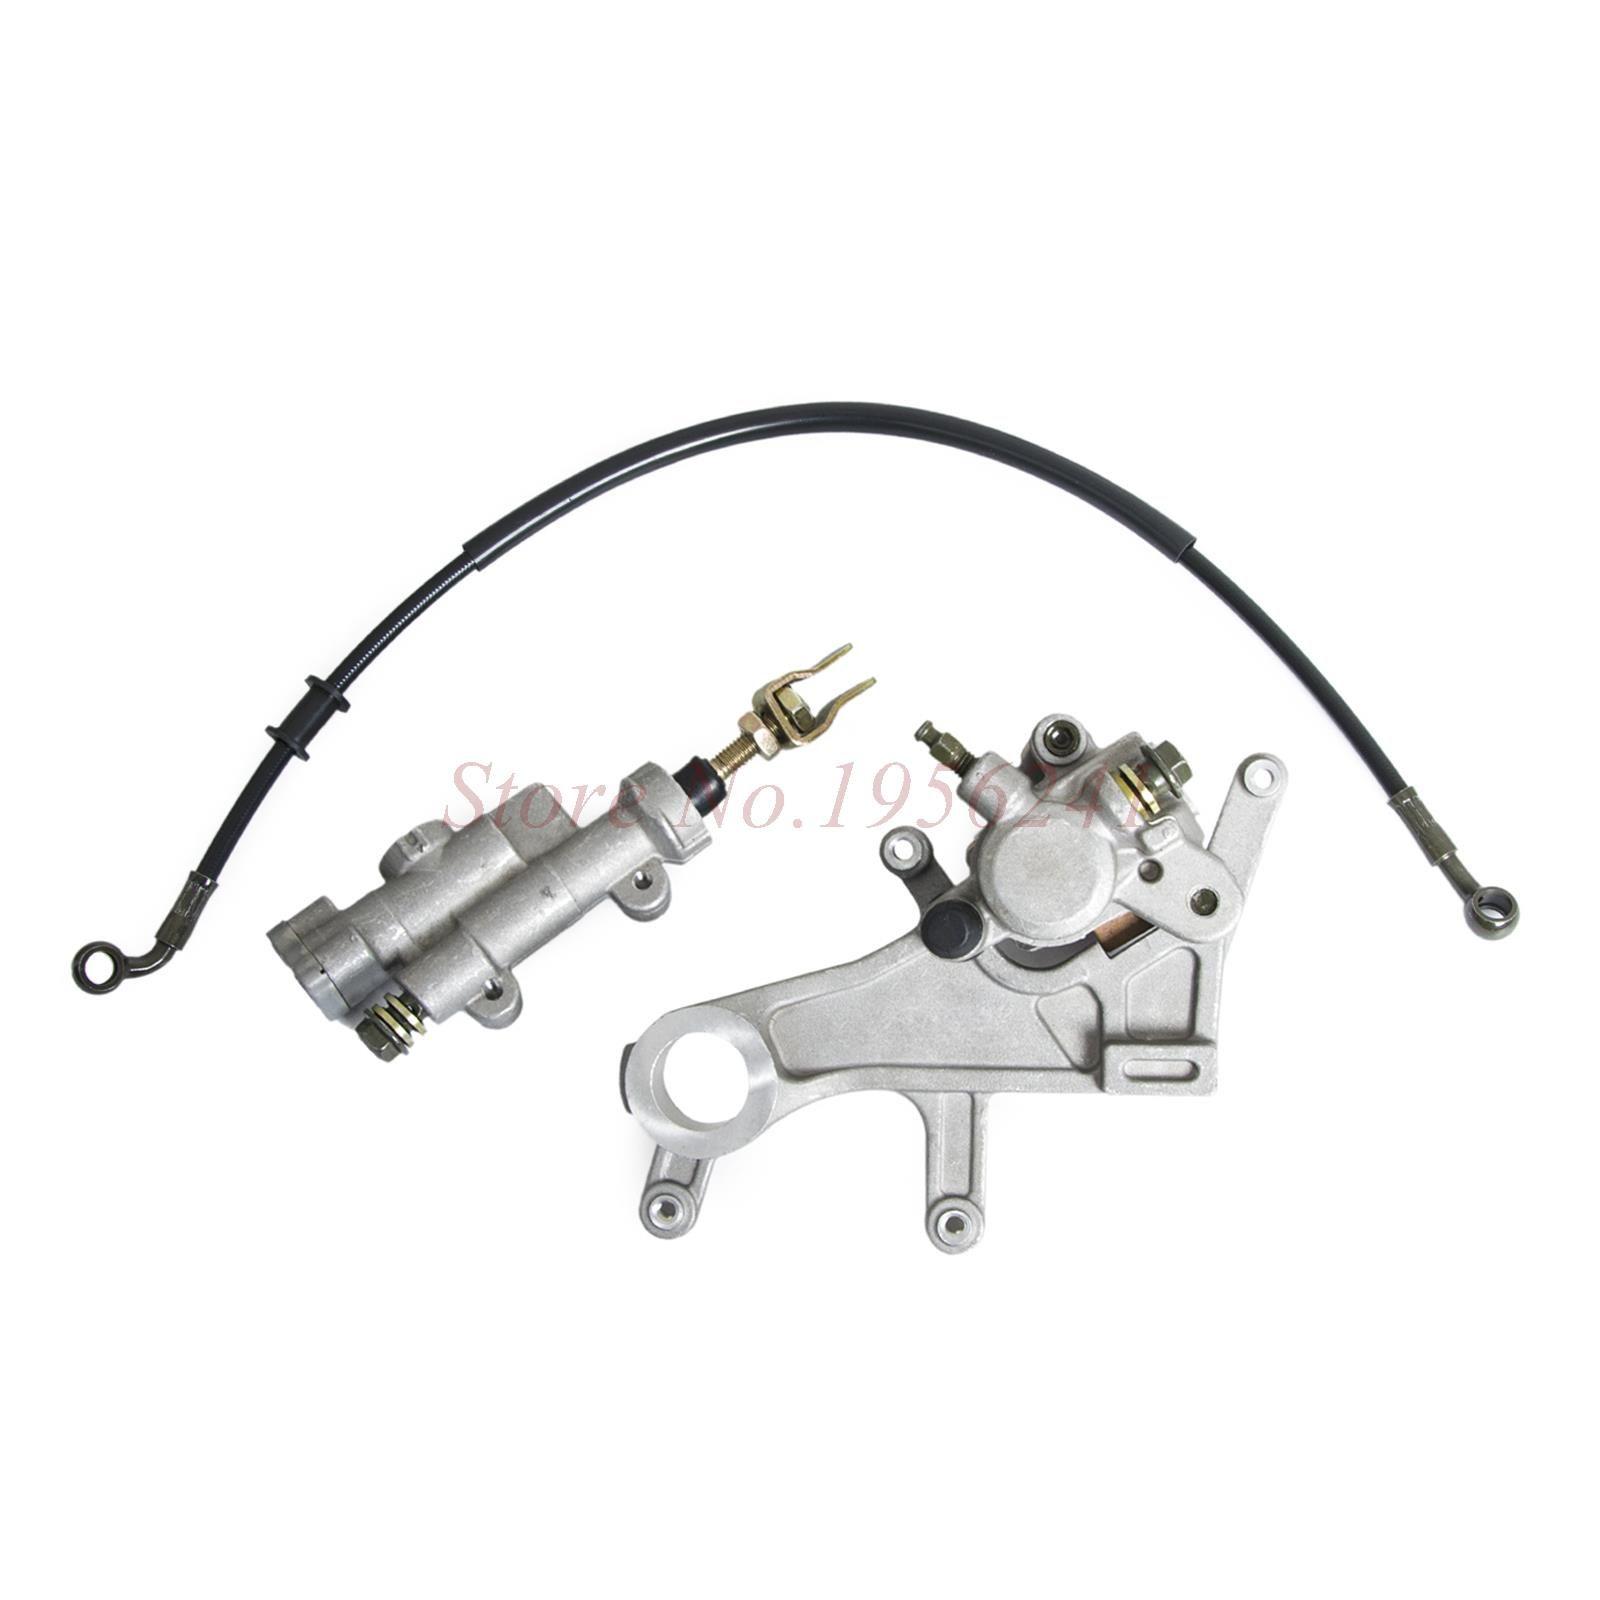 Rear Brake Caliper Master Cylinder & Pads & Brake Oil Hose Pipe For Honda CRF450R 2002-2016 CRF450X 2005 2006 & 08 09 & 12-16